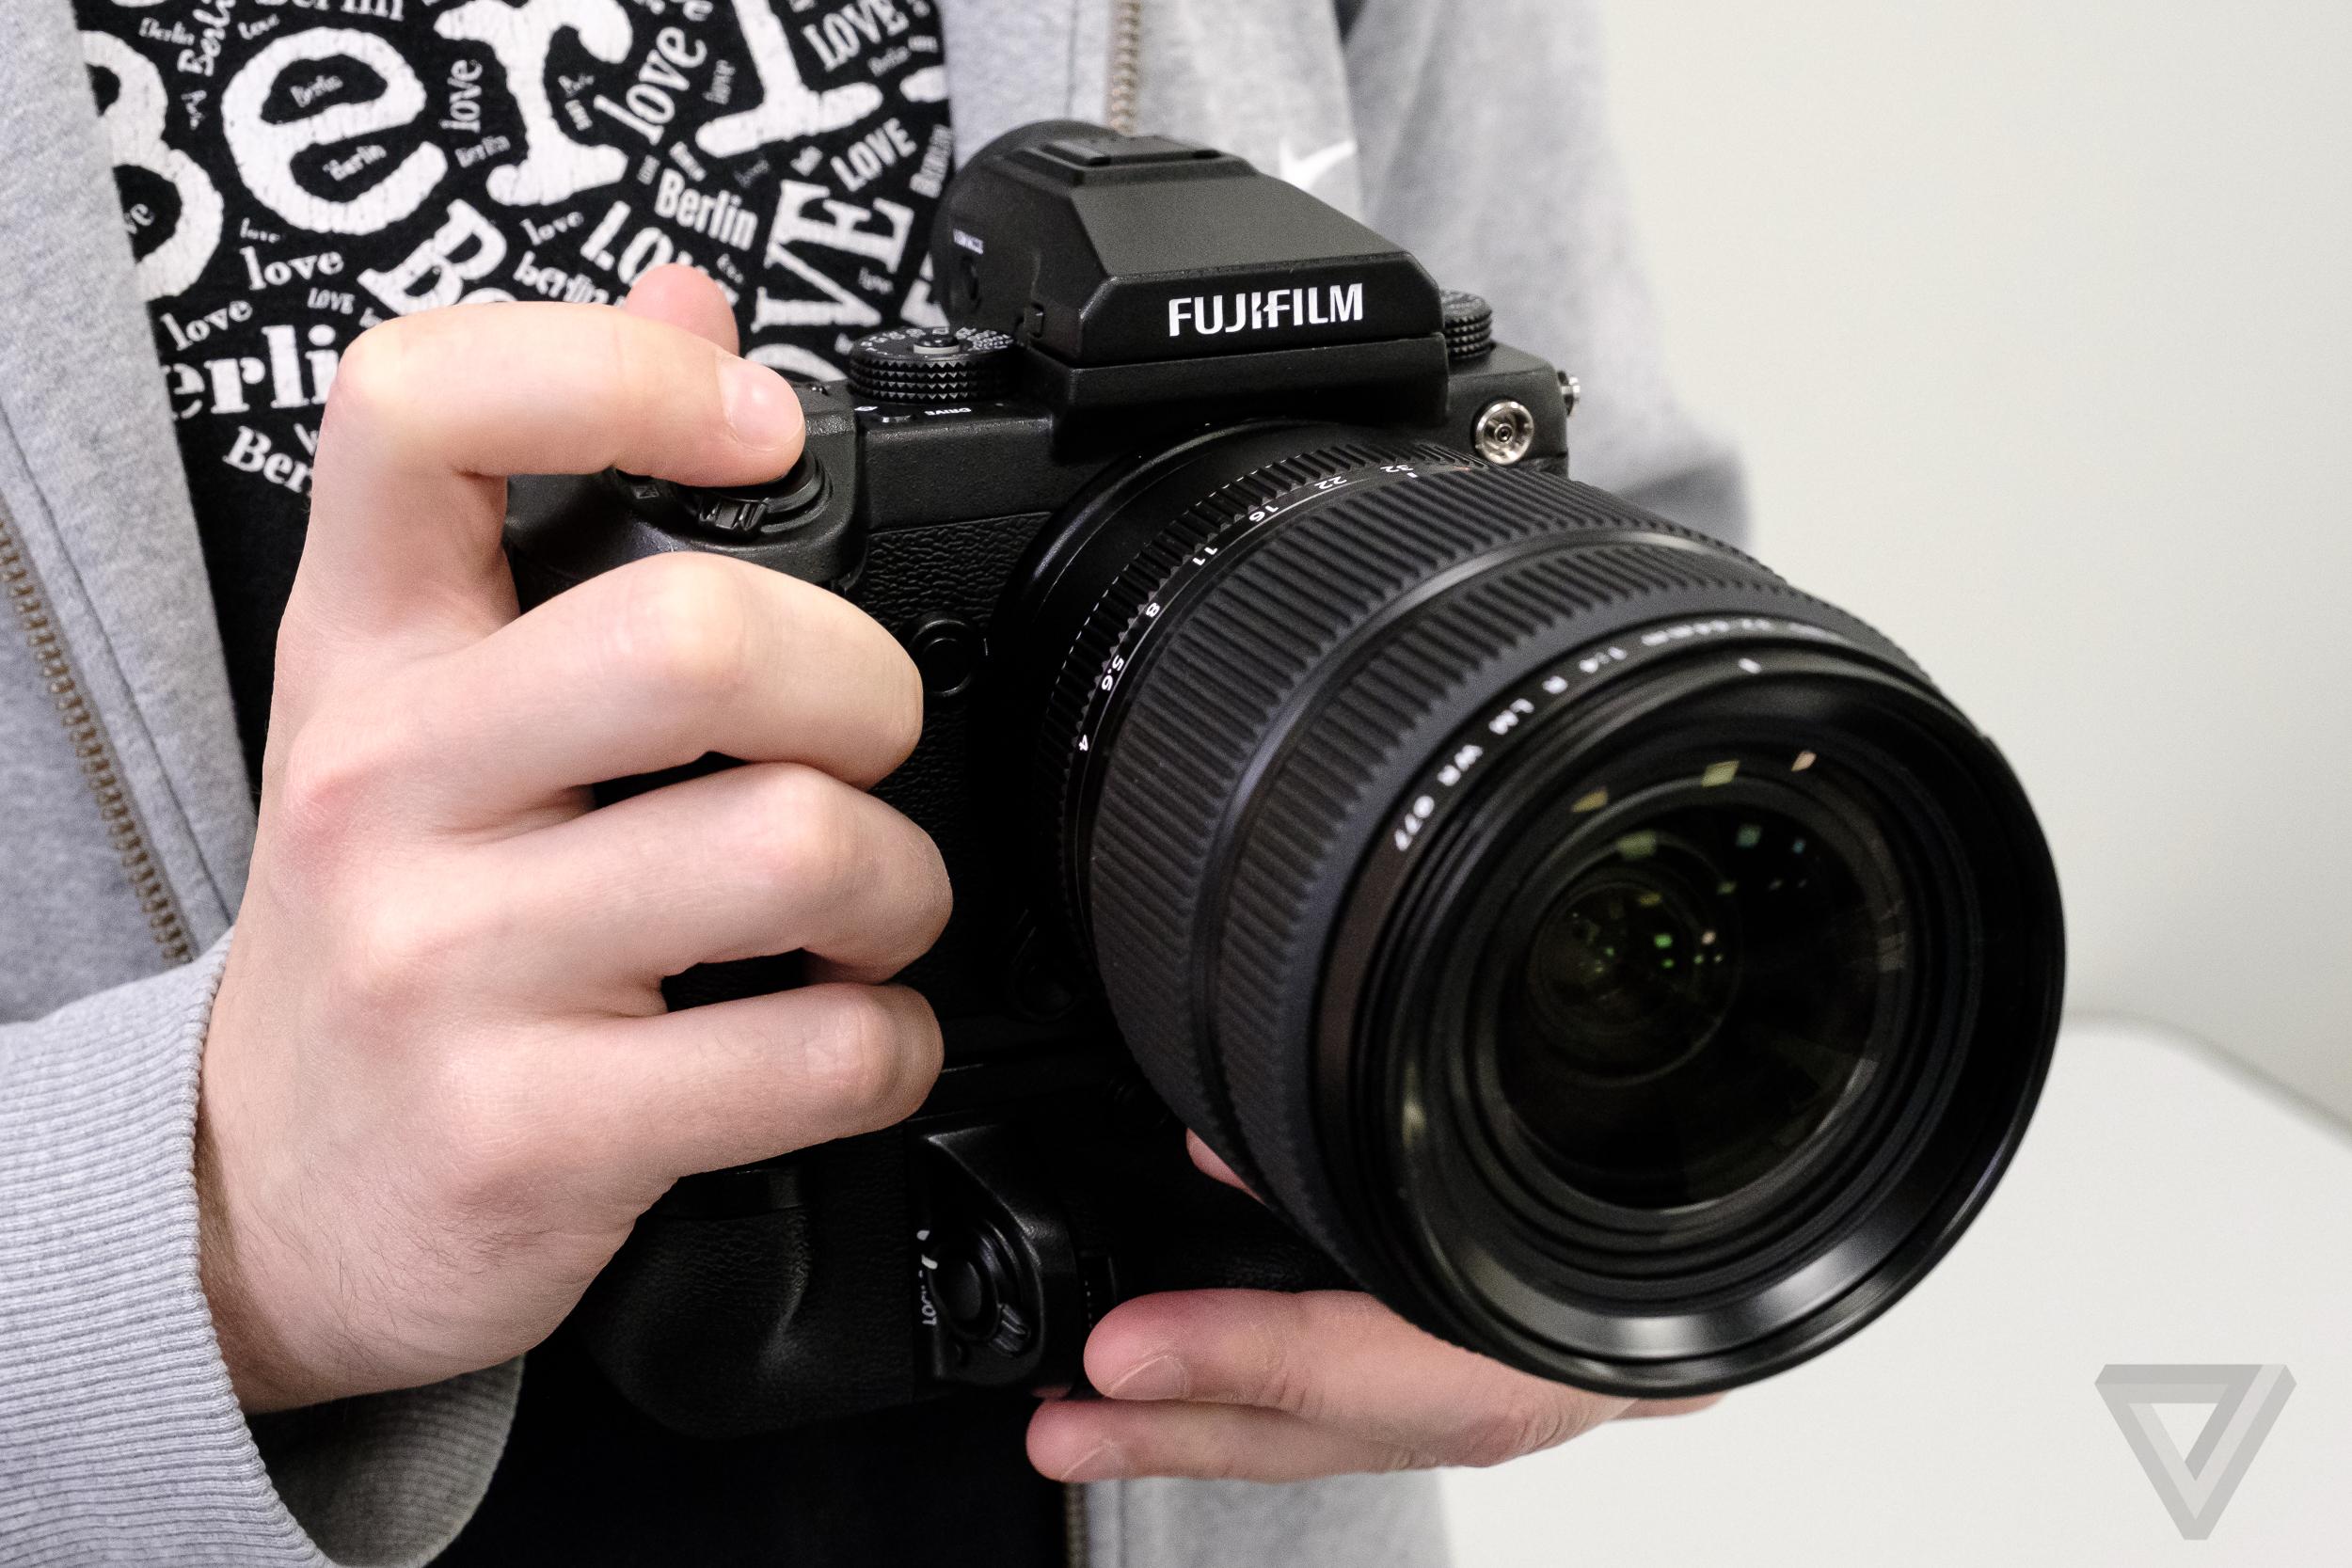 Fujifilm GFX 50 S photos